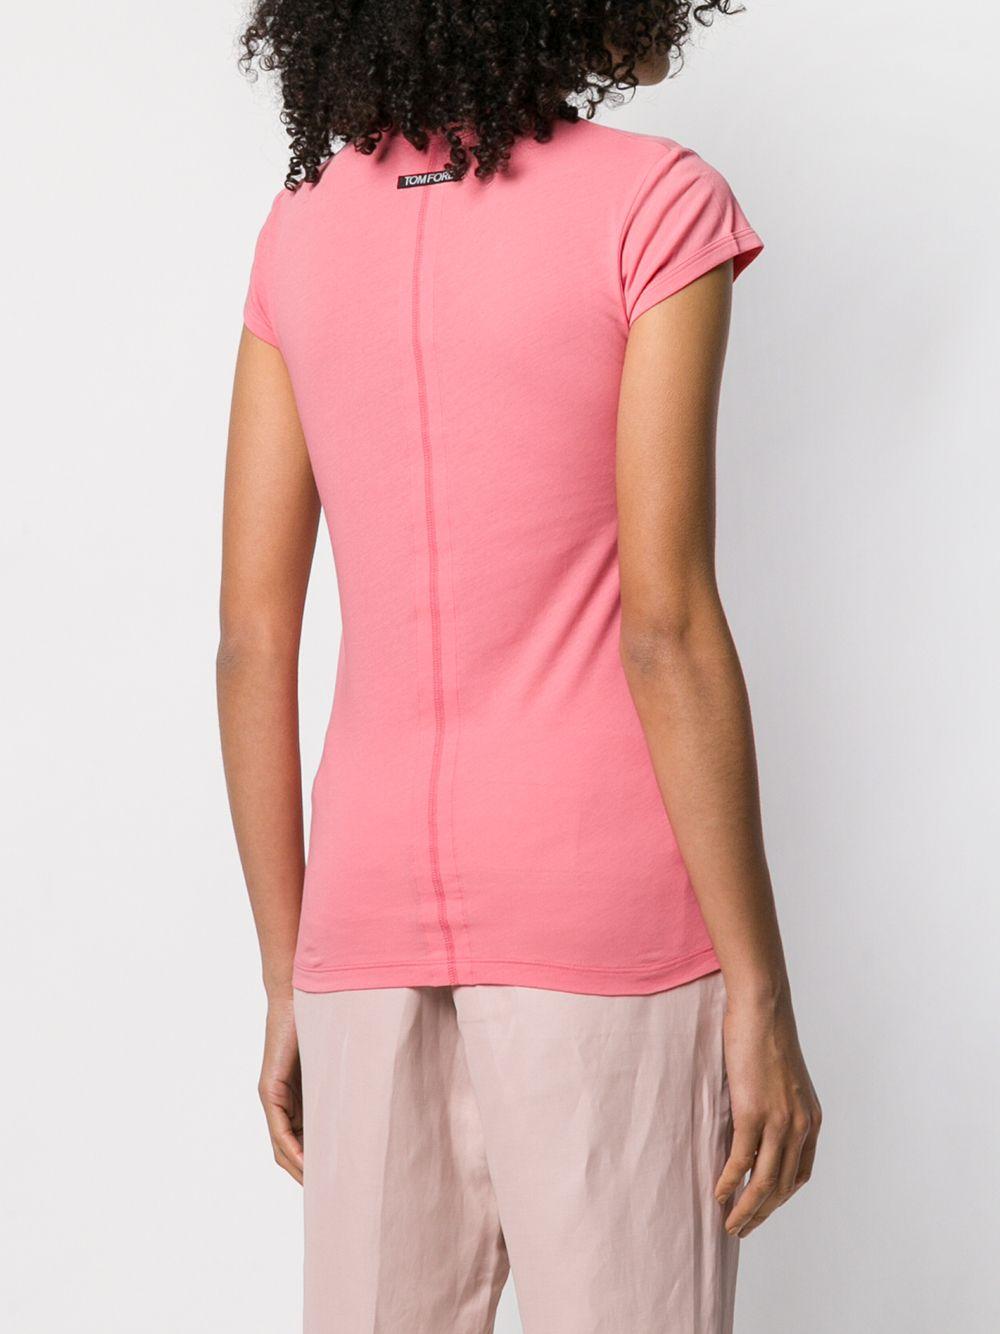 Tom Ford | футболка с круглым вырезом | Clouty